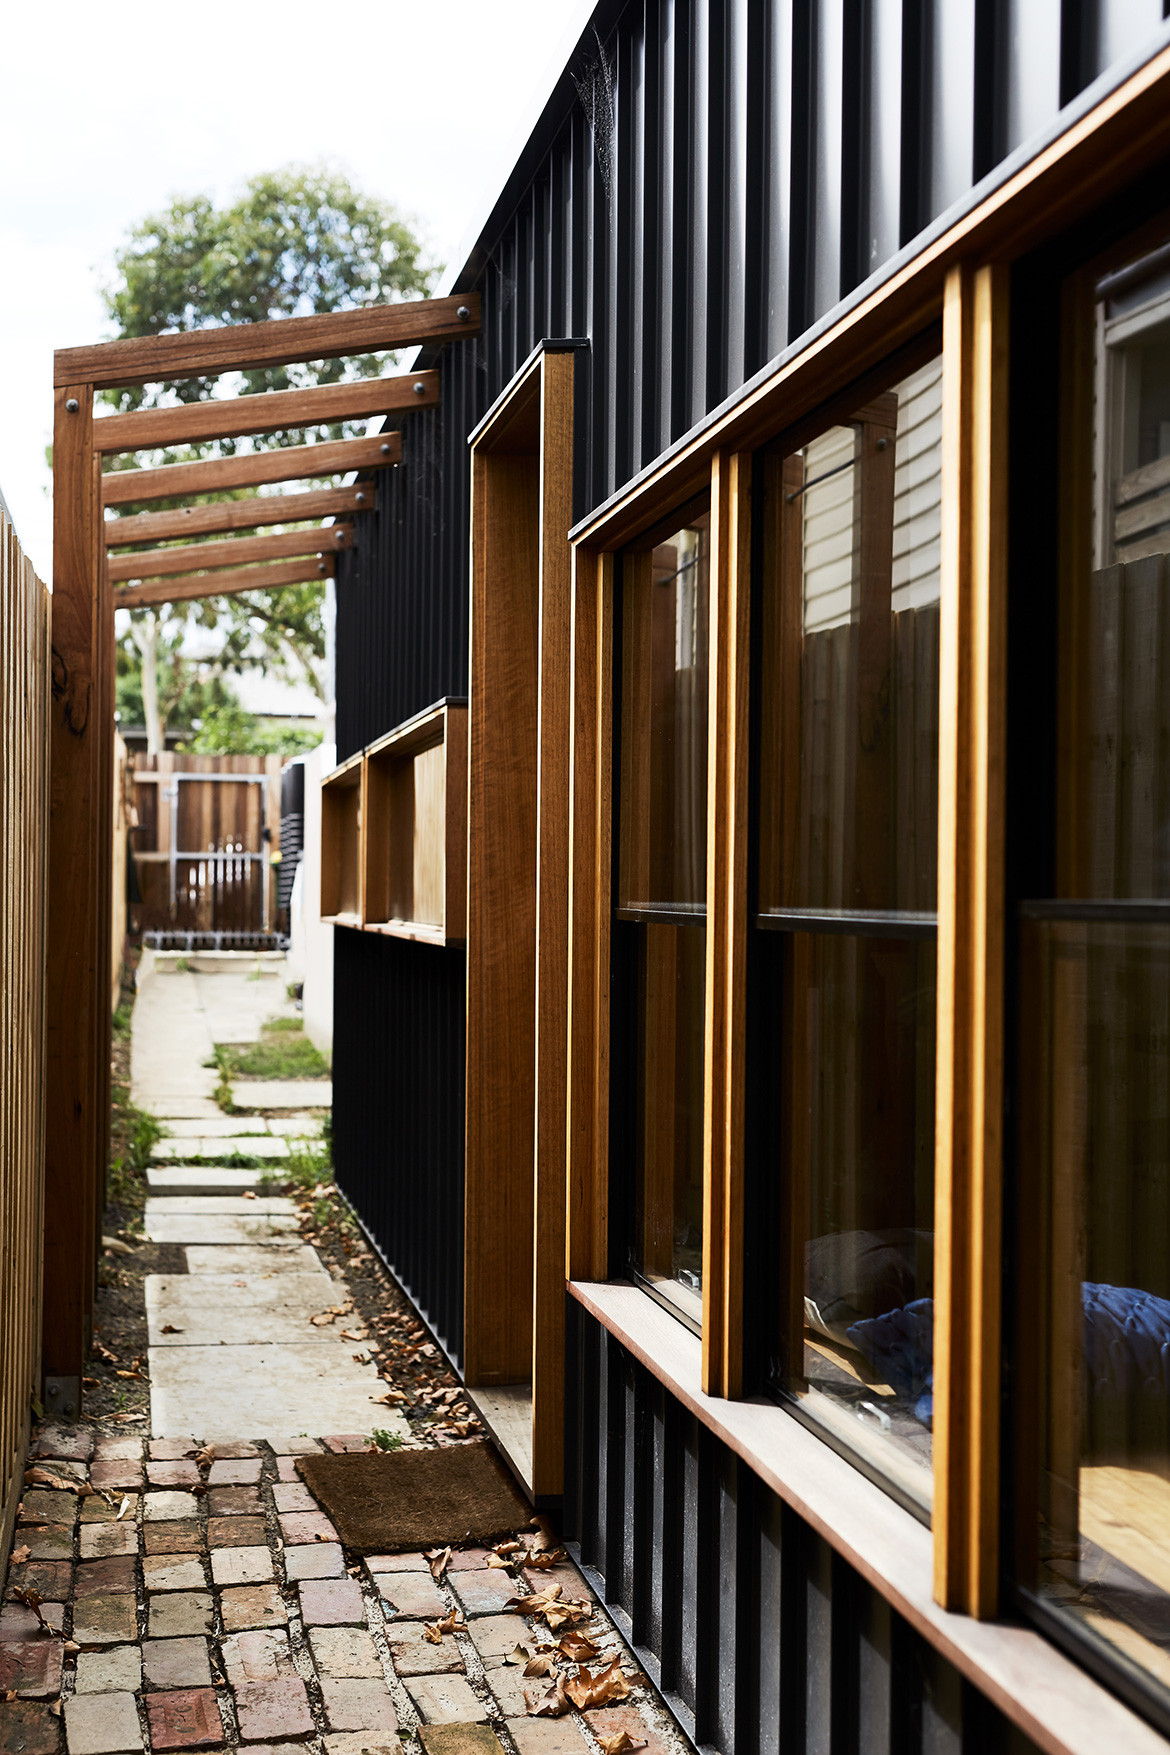 Split End House Mártires Doyle CC Jonathon Griggs exterior alleyway